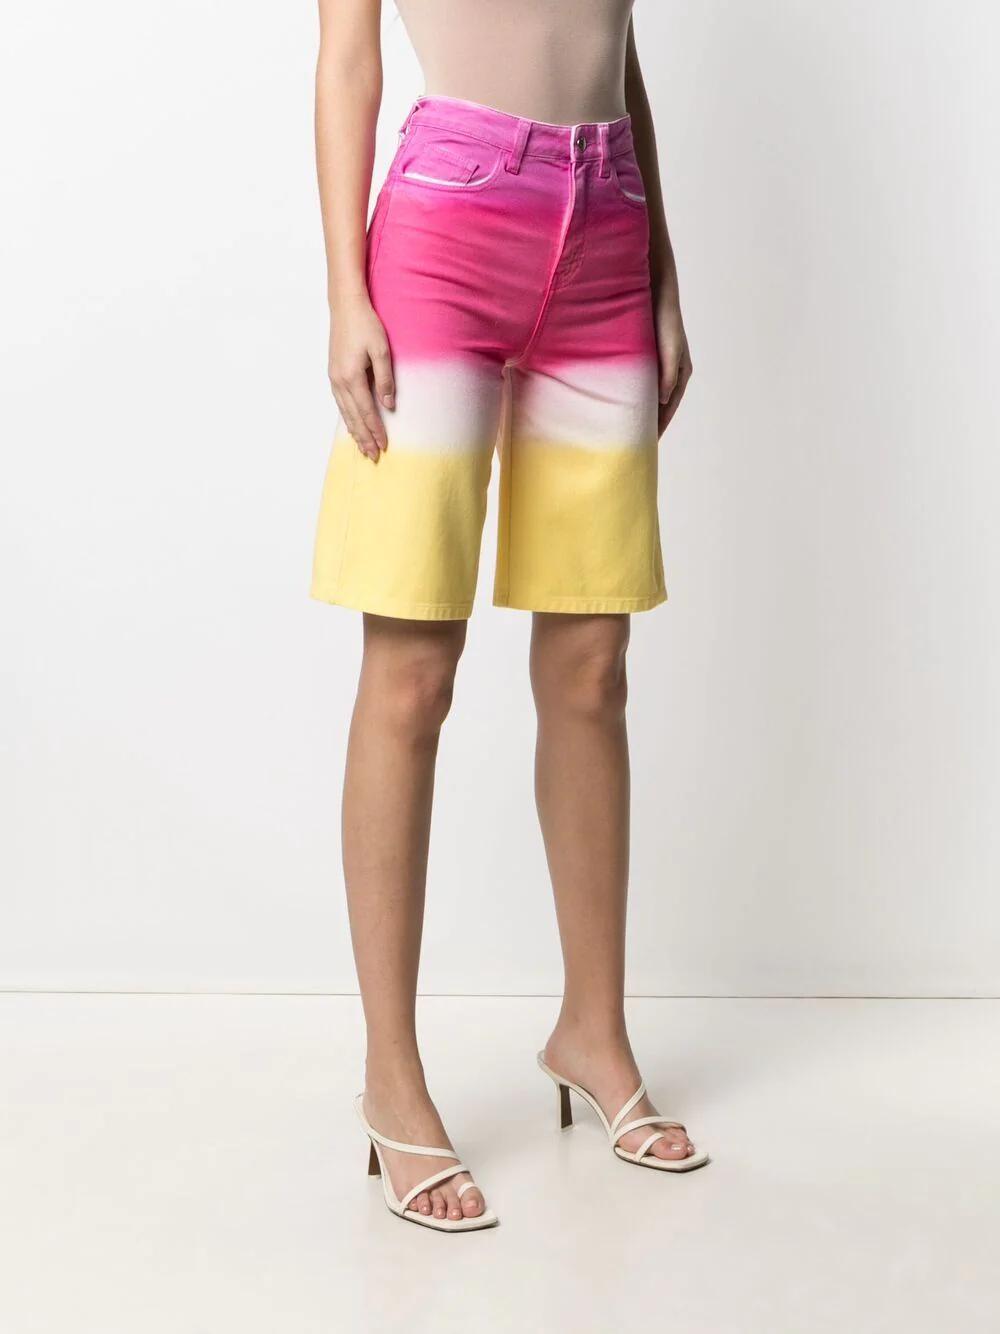 IRENEISGOOD High-rise Gradient Shorts 285лв